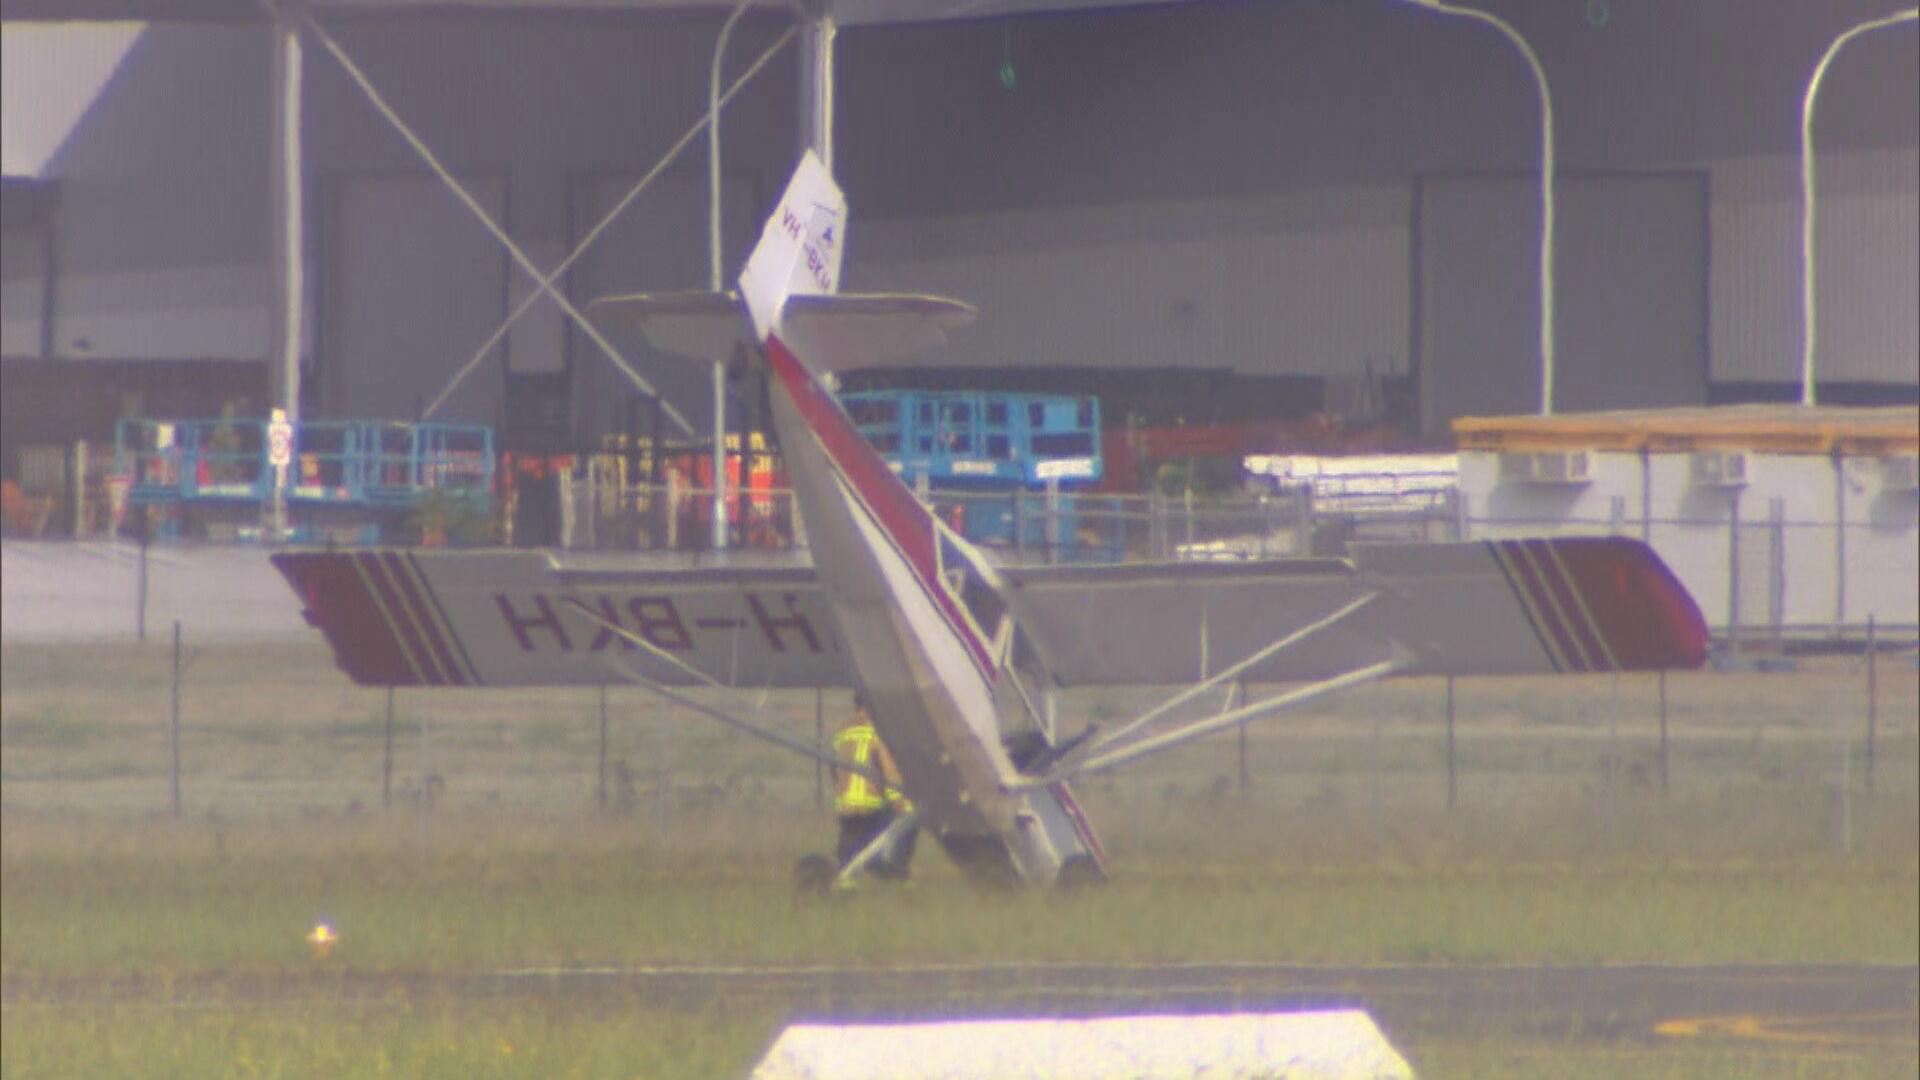 Pilot crash lands light plane on its nose at Bankstown Airport